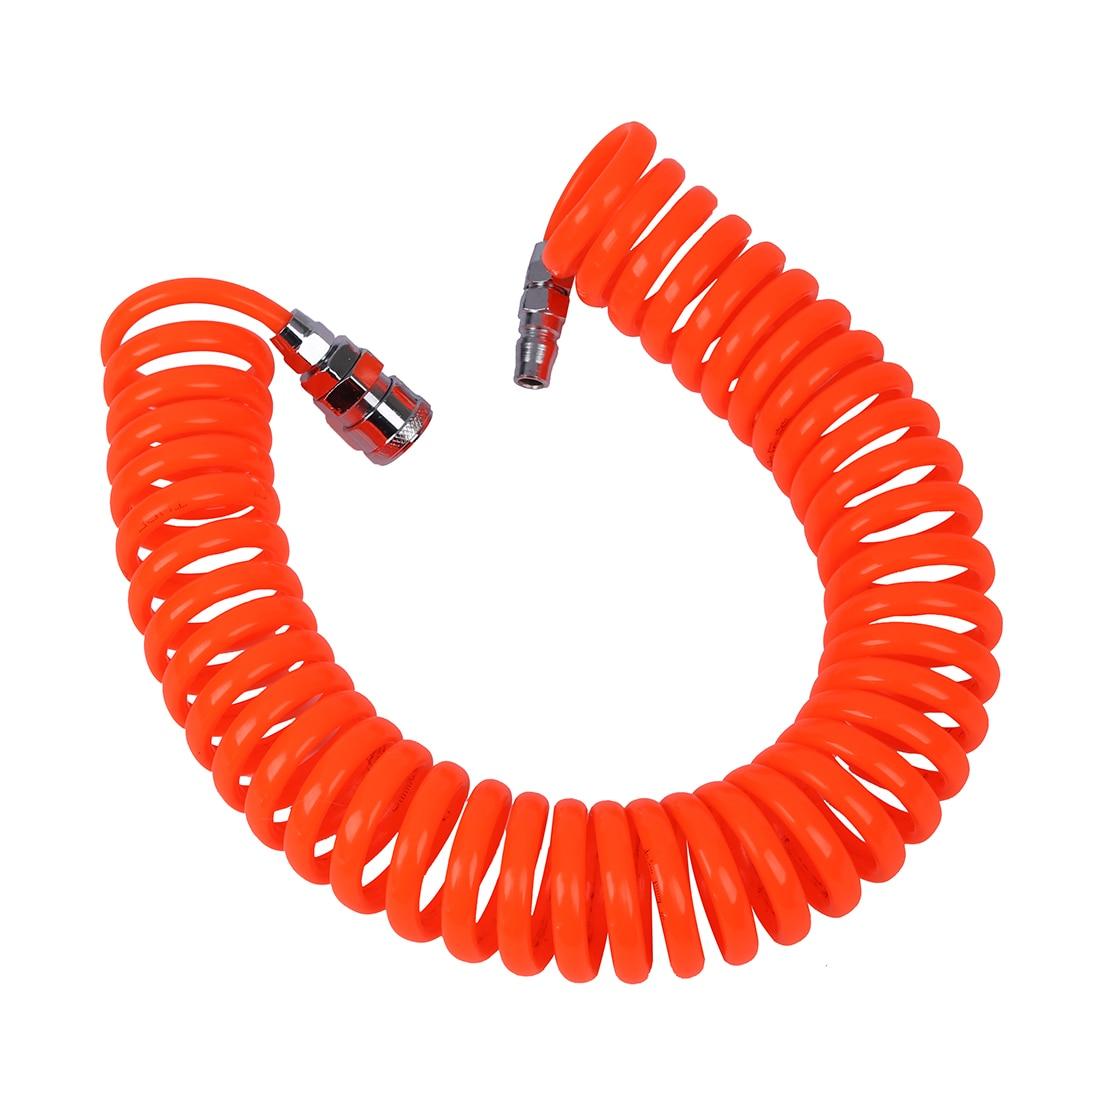 CNIM Hot 6M 19.7Ft 8mm x 5mm Flexible PU Recoil Hose Tube for Compressor Air Tool